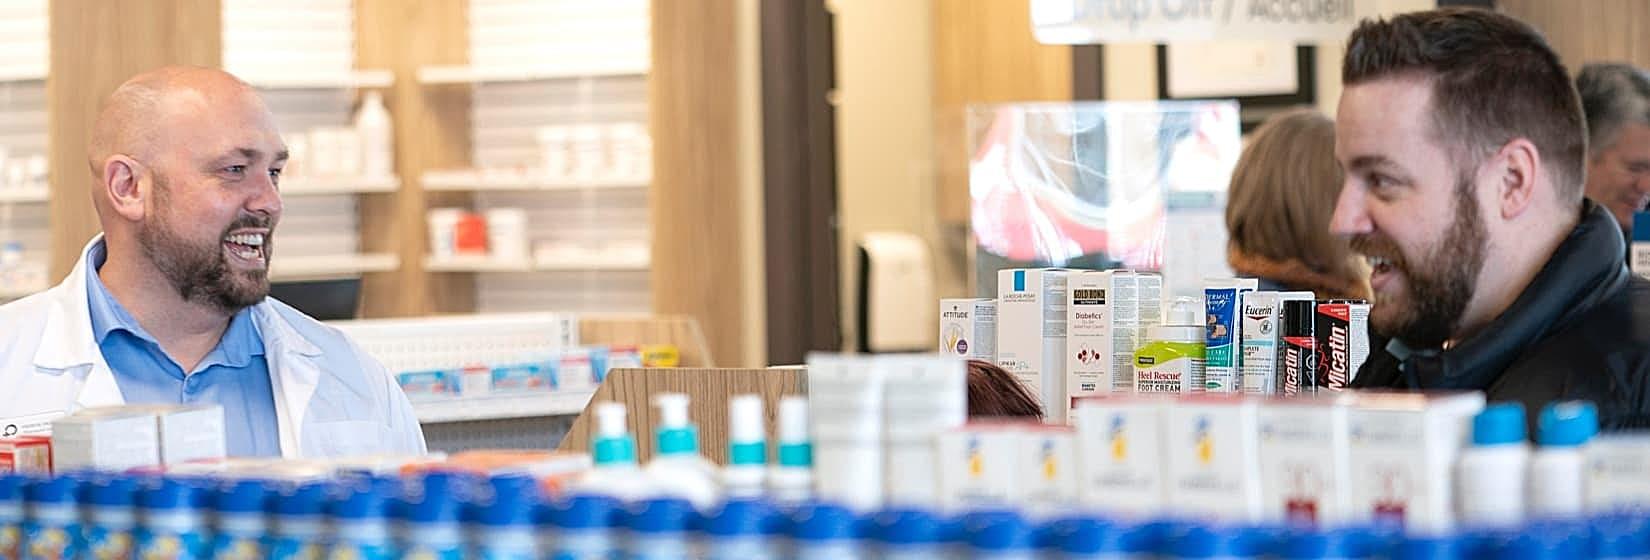 Prescription dispensing, Harrisville Pharmacy, Moncton